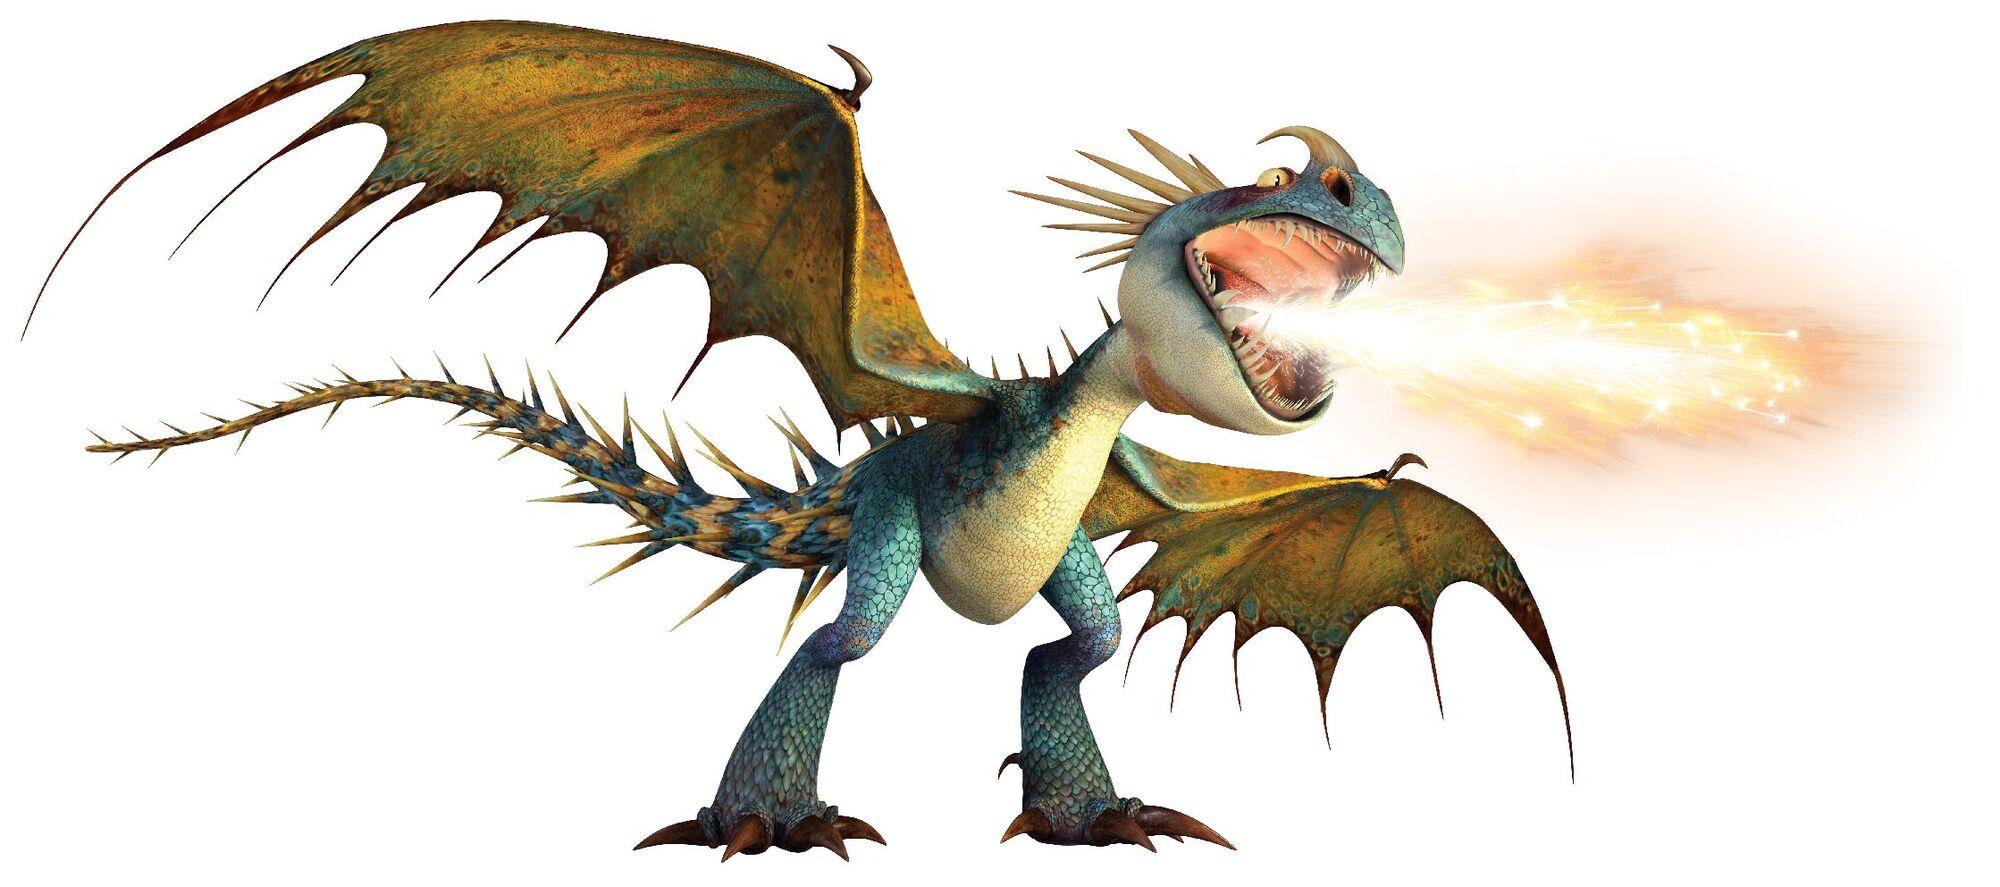 Dragons Teste Dich